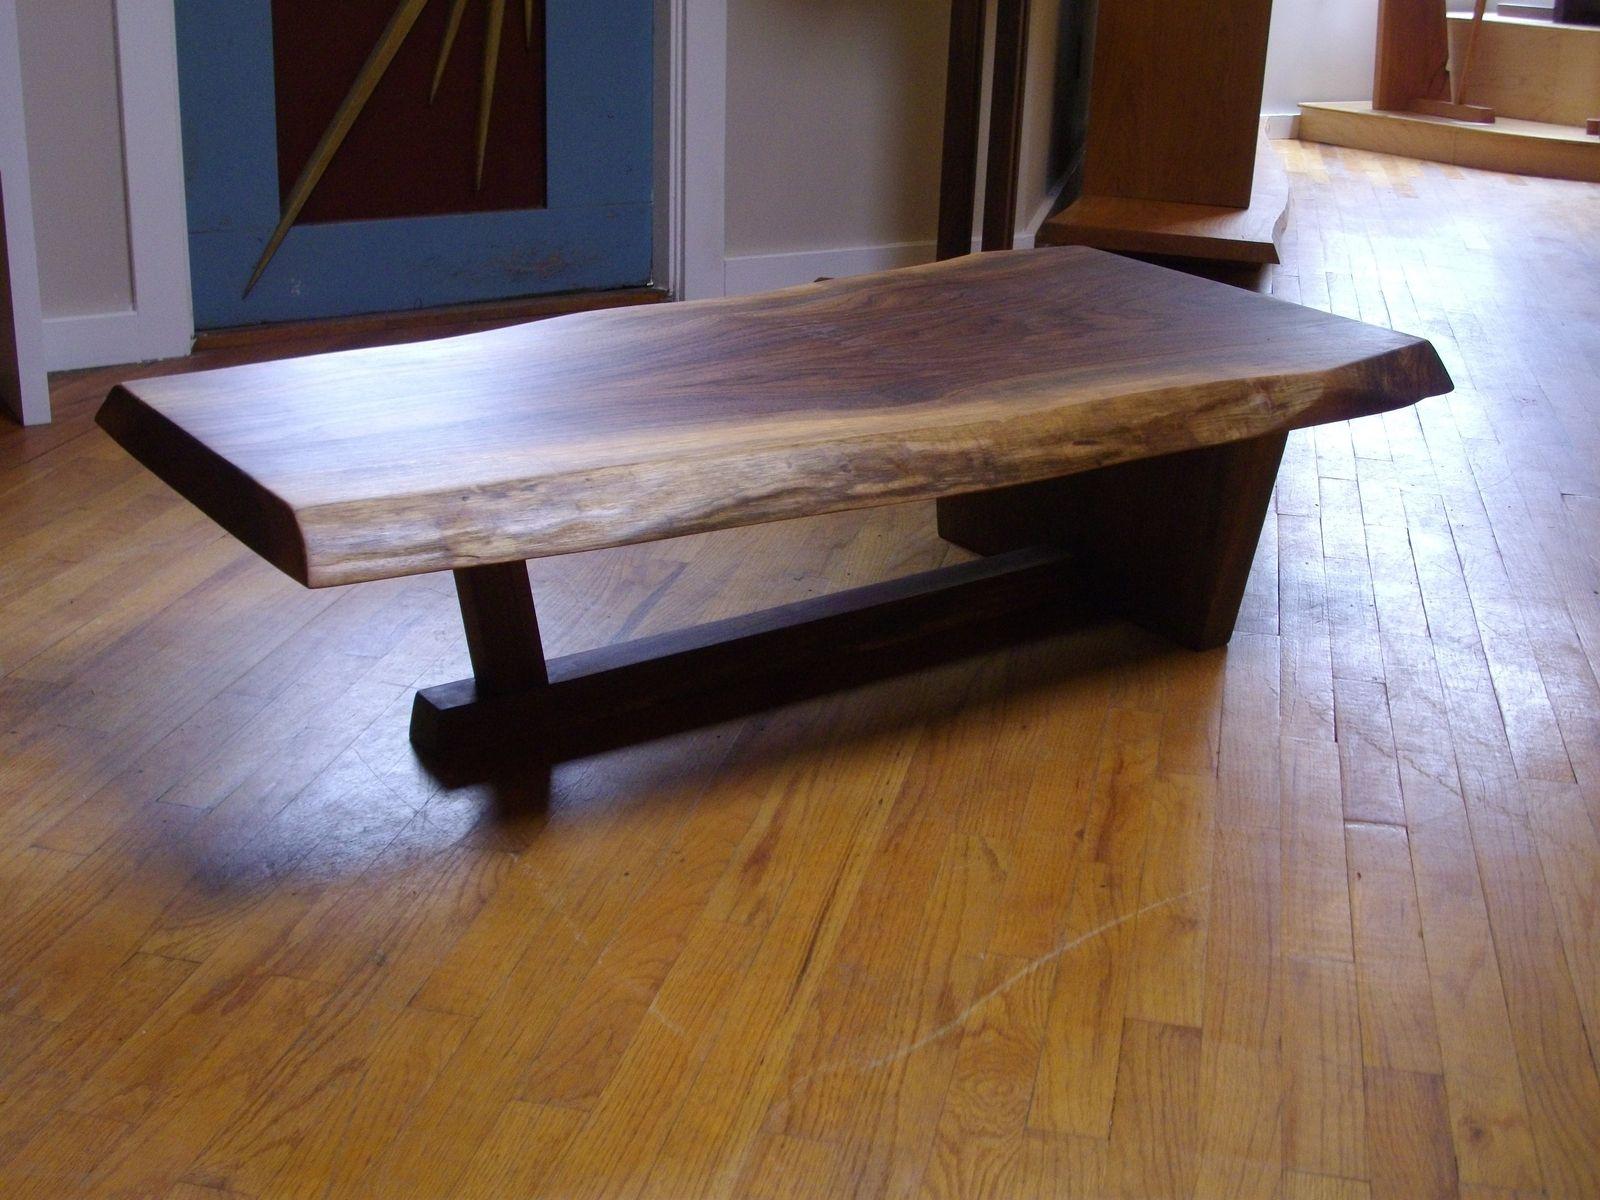 Live Edge Coffee Table Live Edge Coffee Table Coffee Table Wood Coffee Table [ 1200 x 1600 Pixel ]